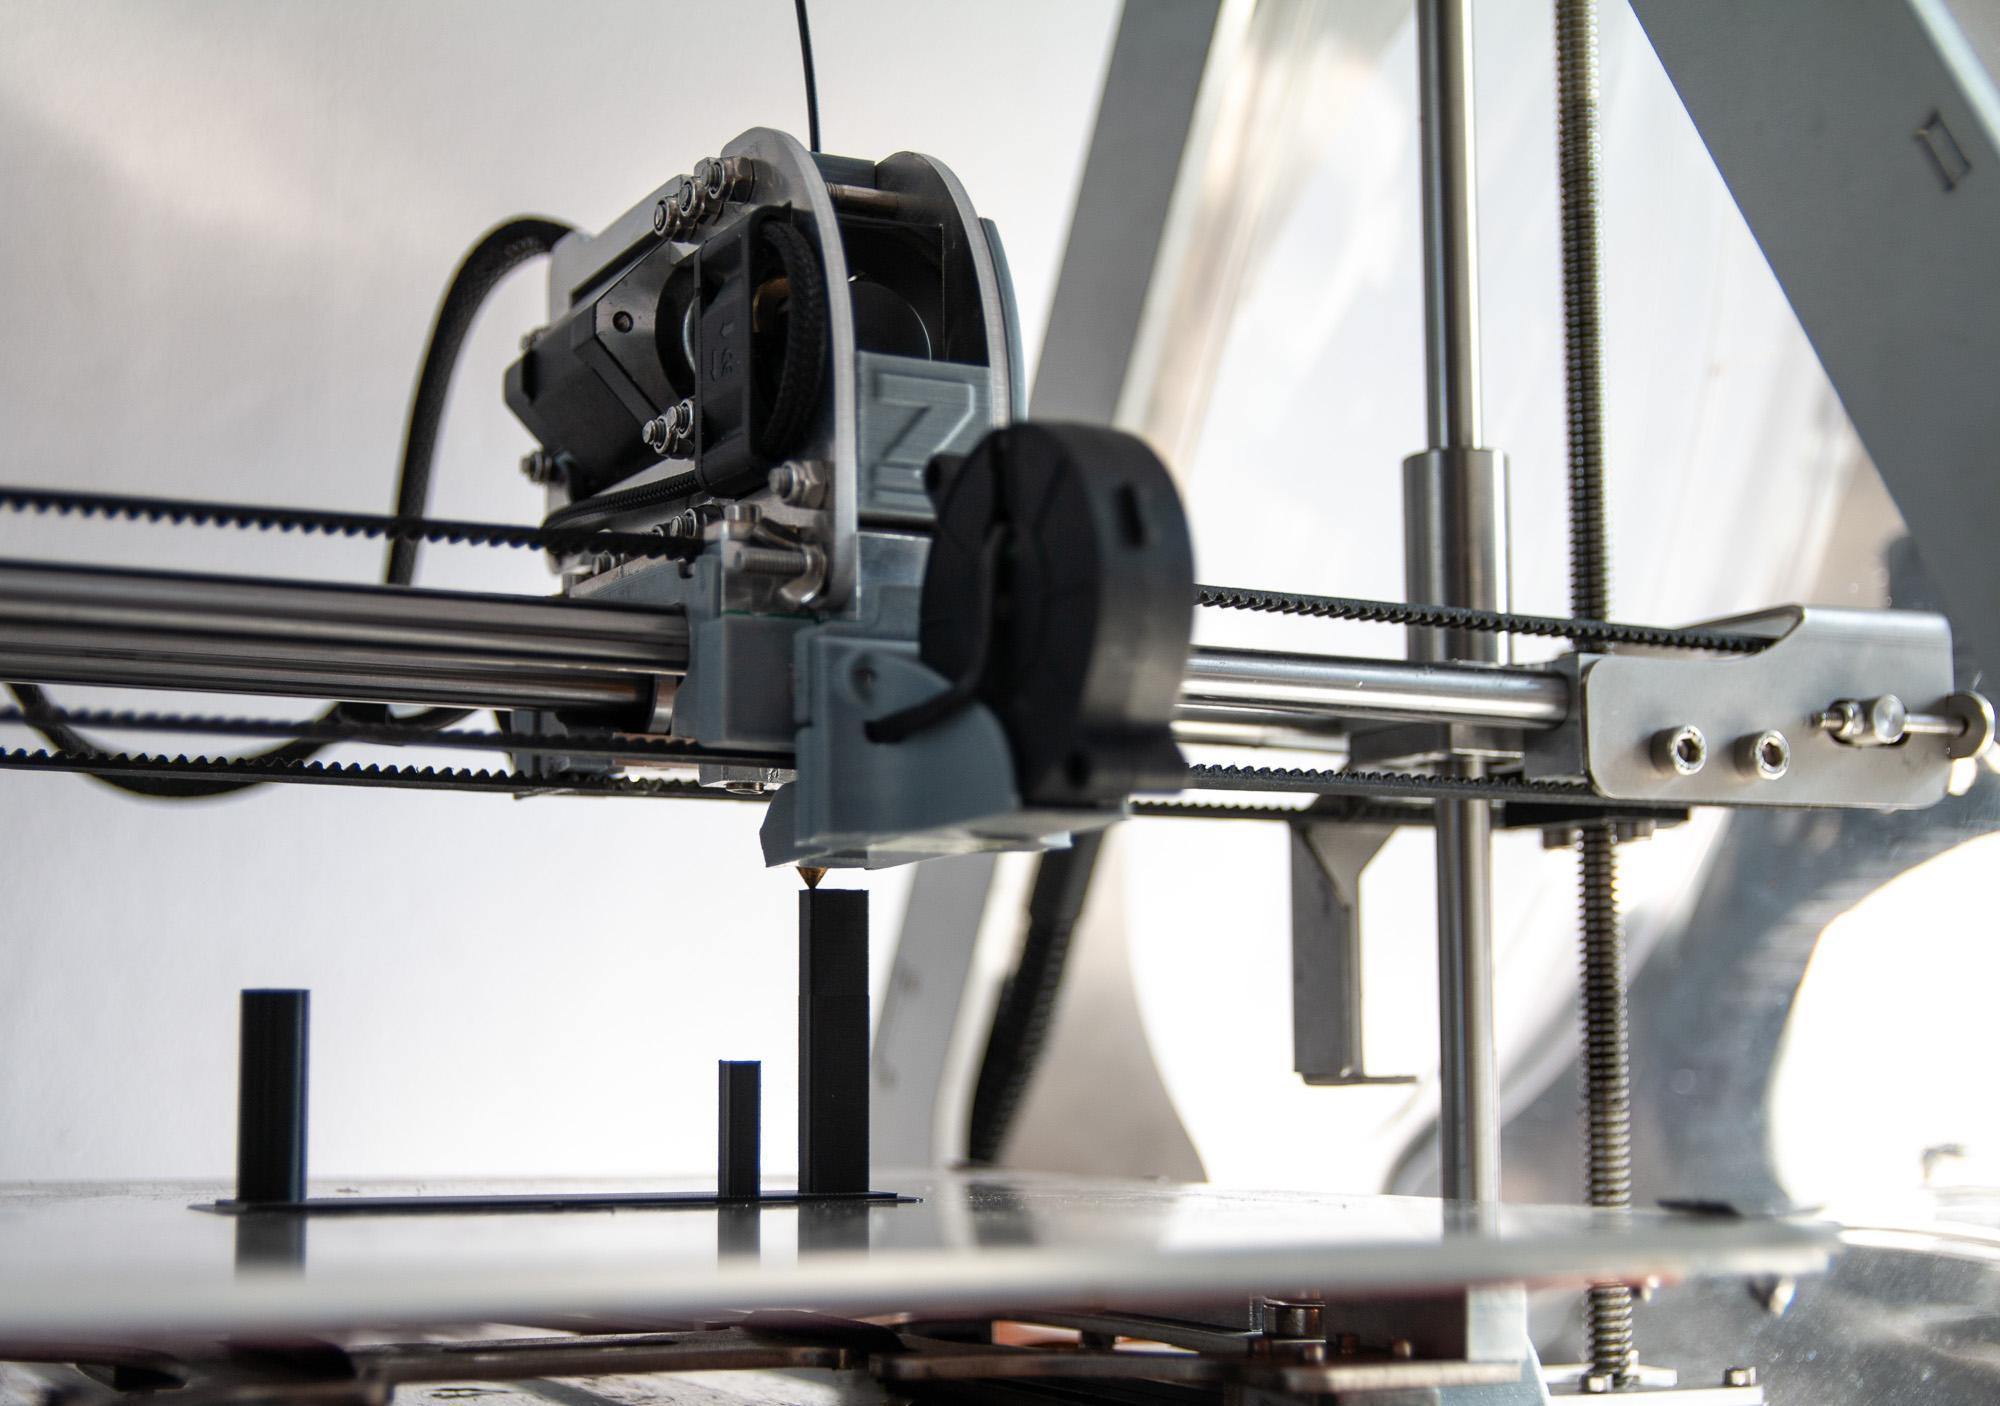 3D printing with ZMorph VX